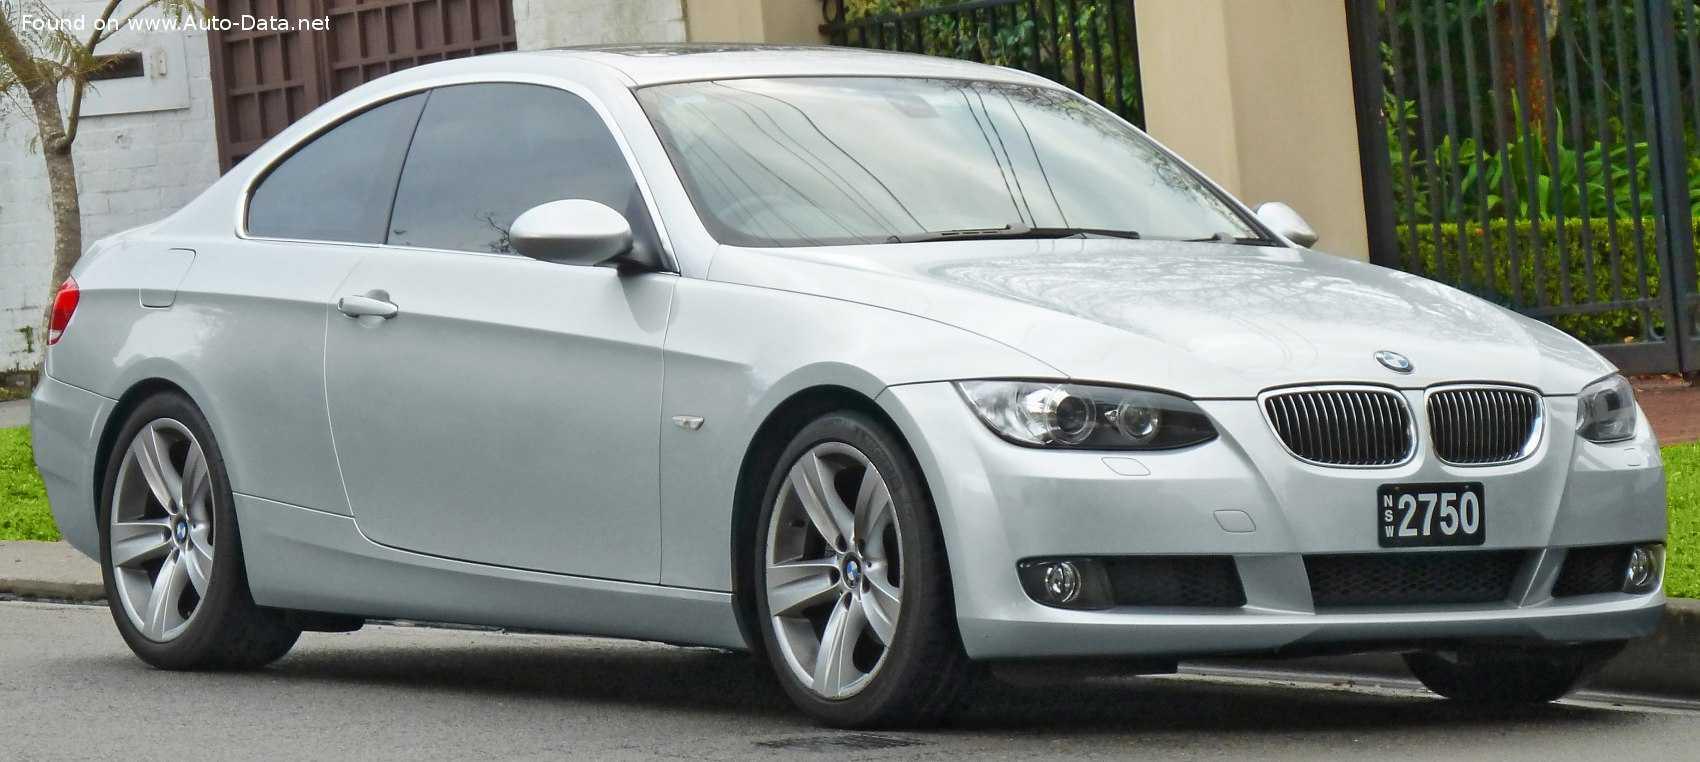 BMW 320i E92 3 Series - параметры - фото